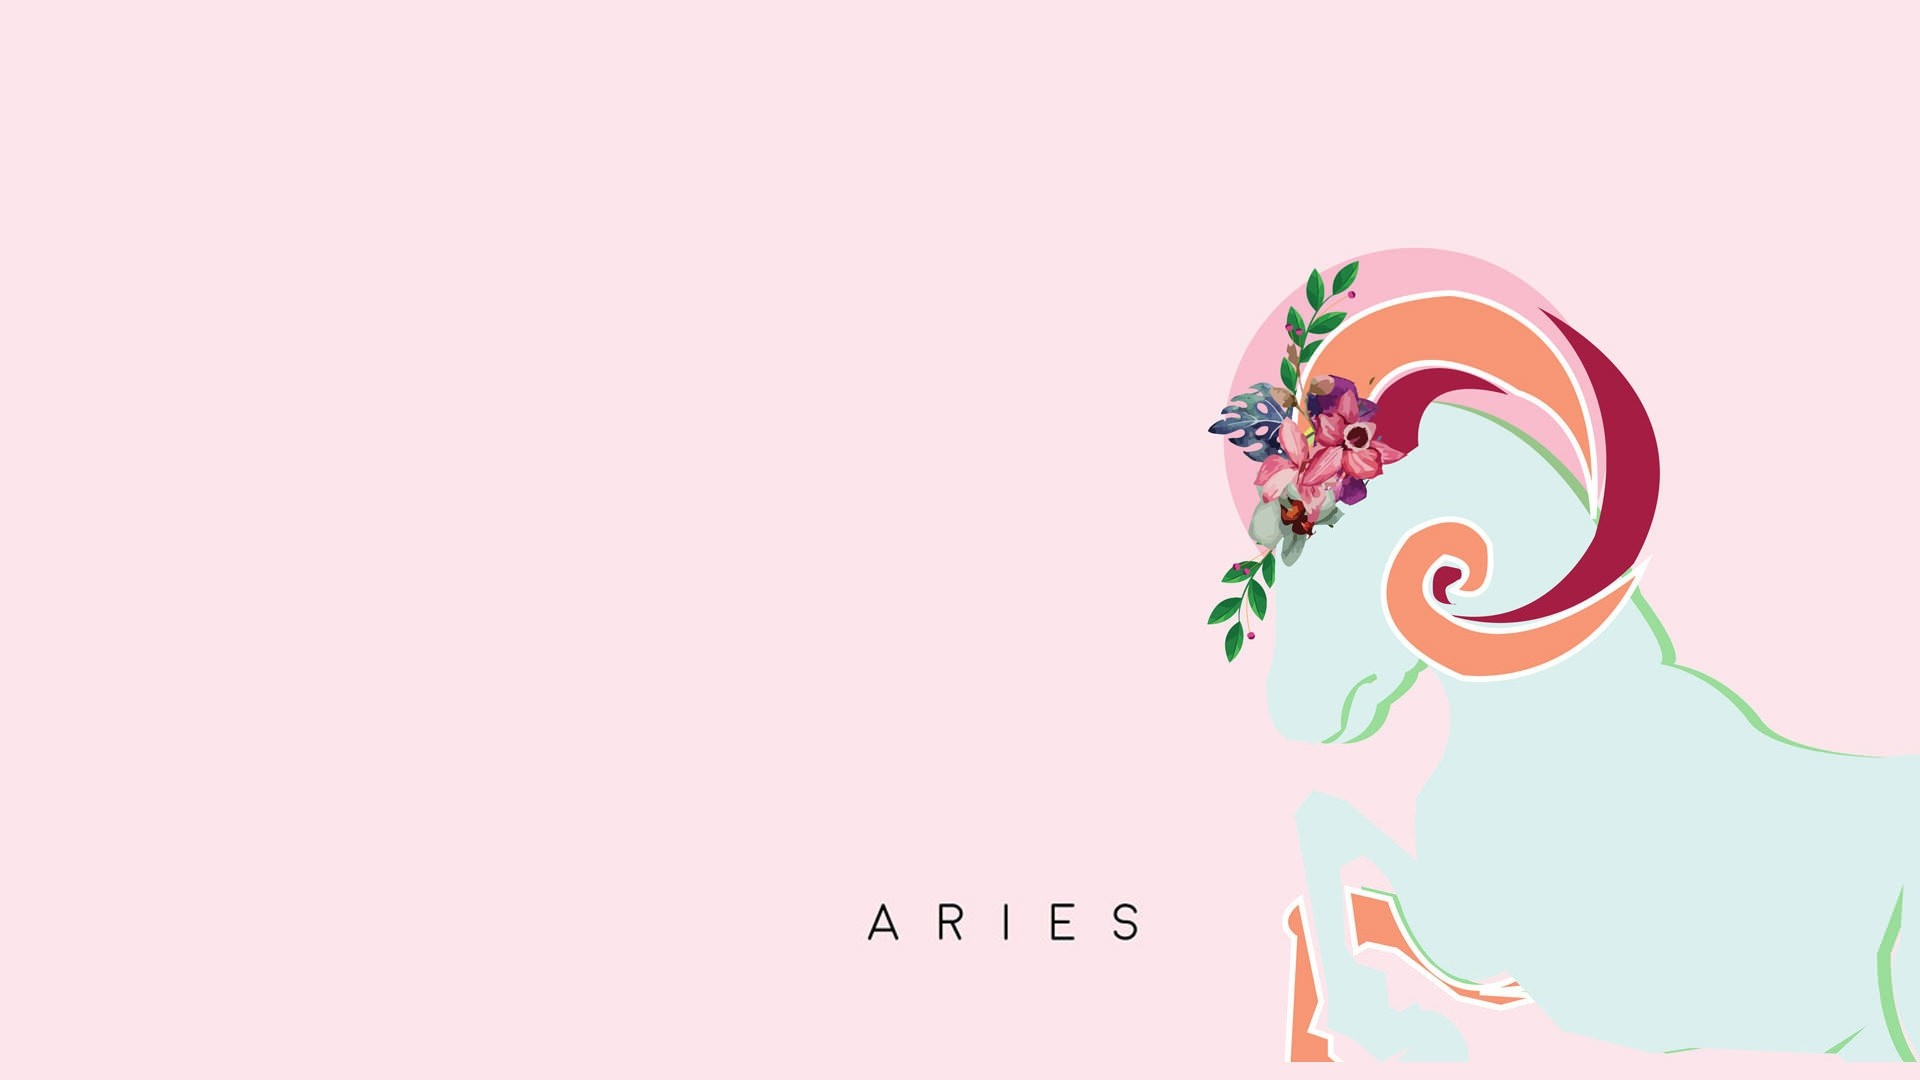 Aries Full HD Wallpaper